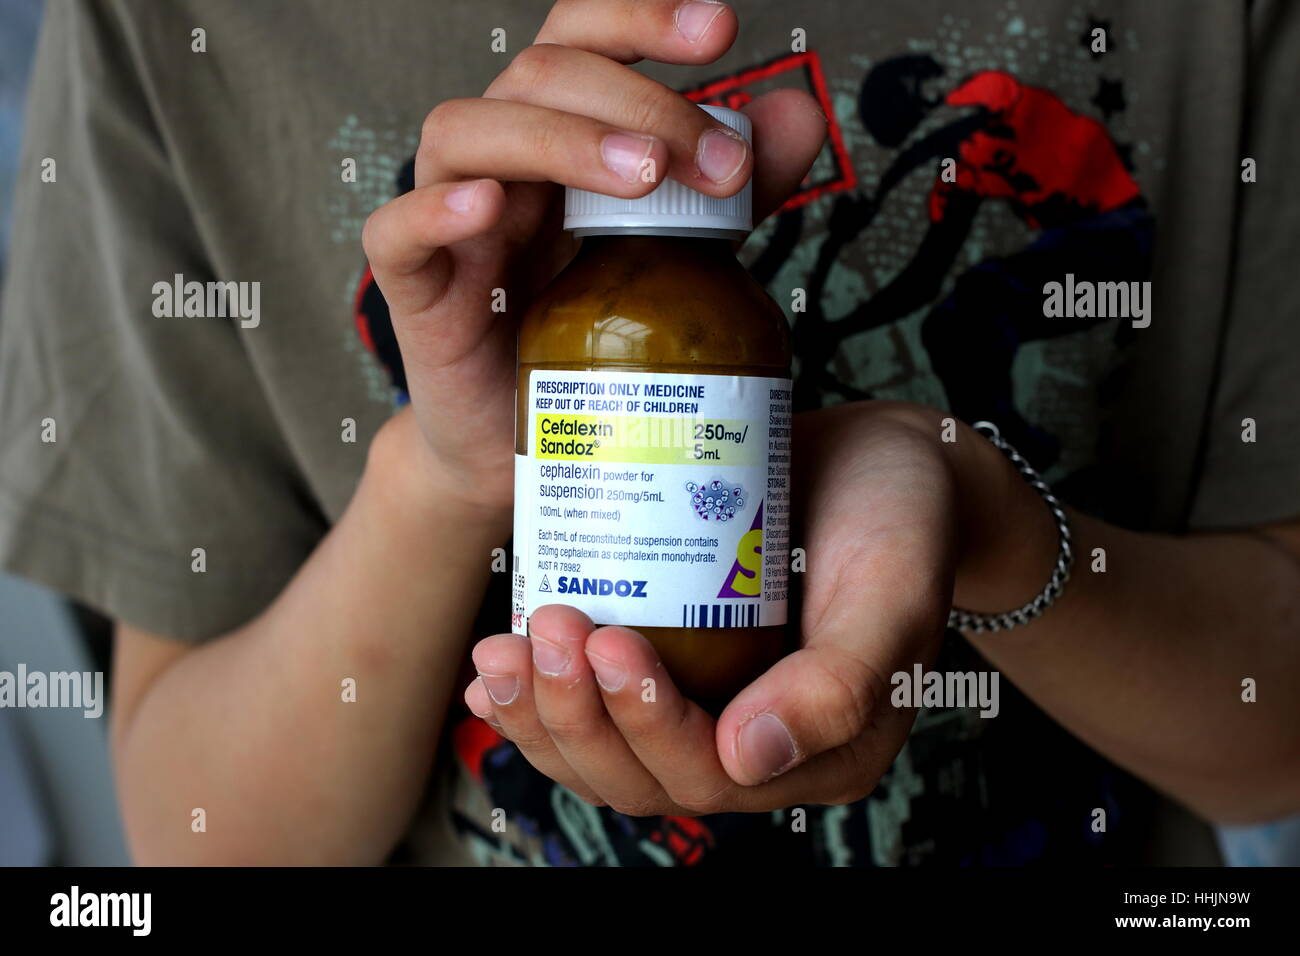 Hand Holding Cefalexin Sandoz antibiotic - Stock Image